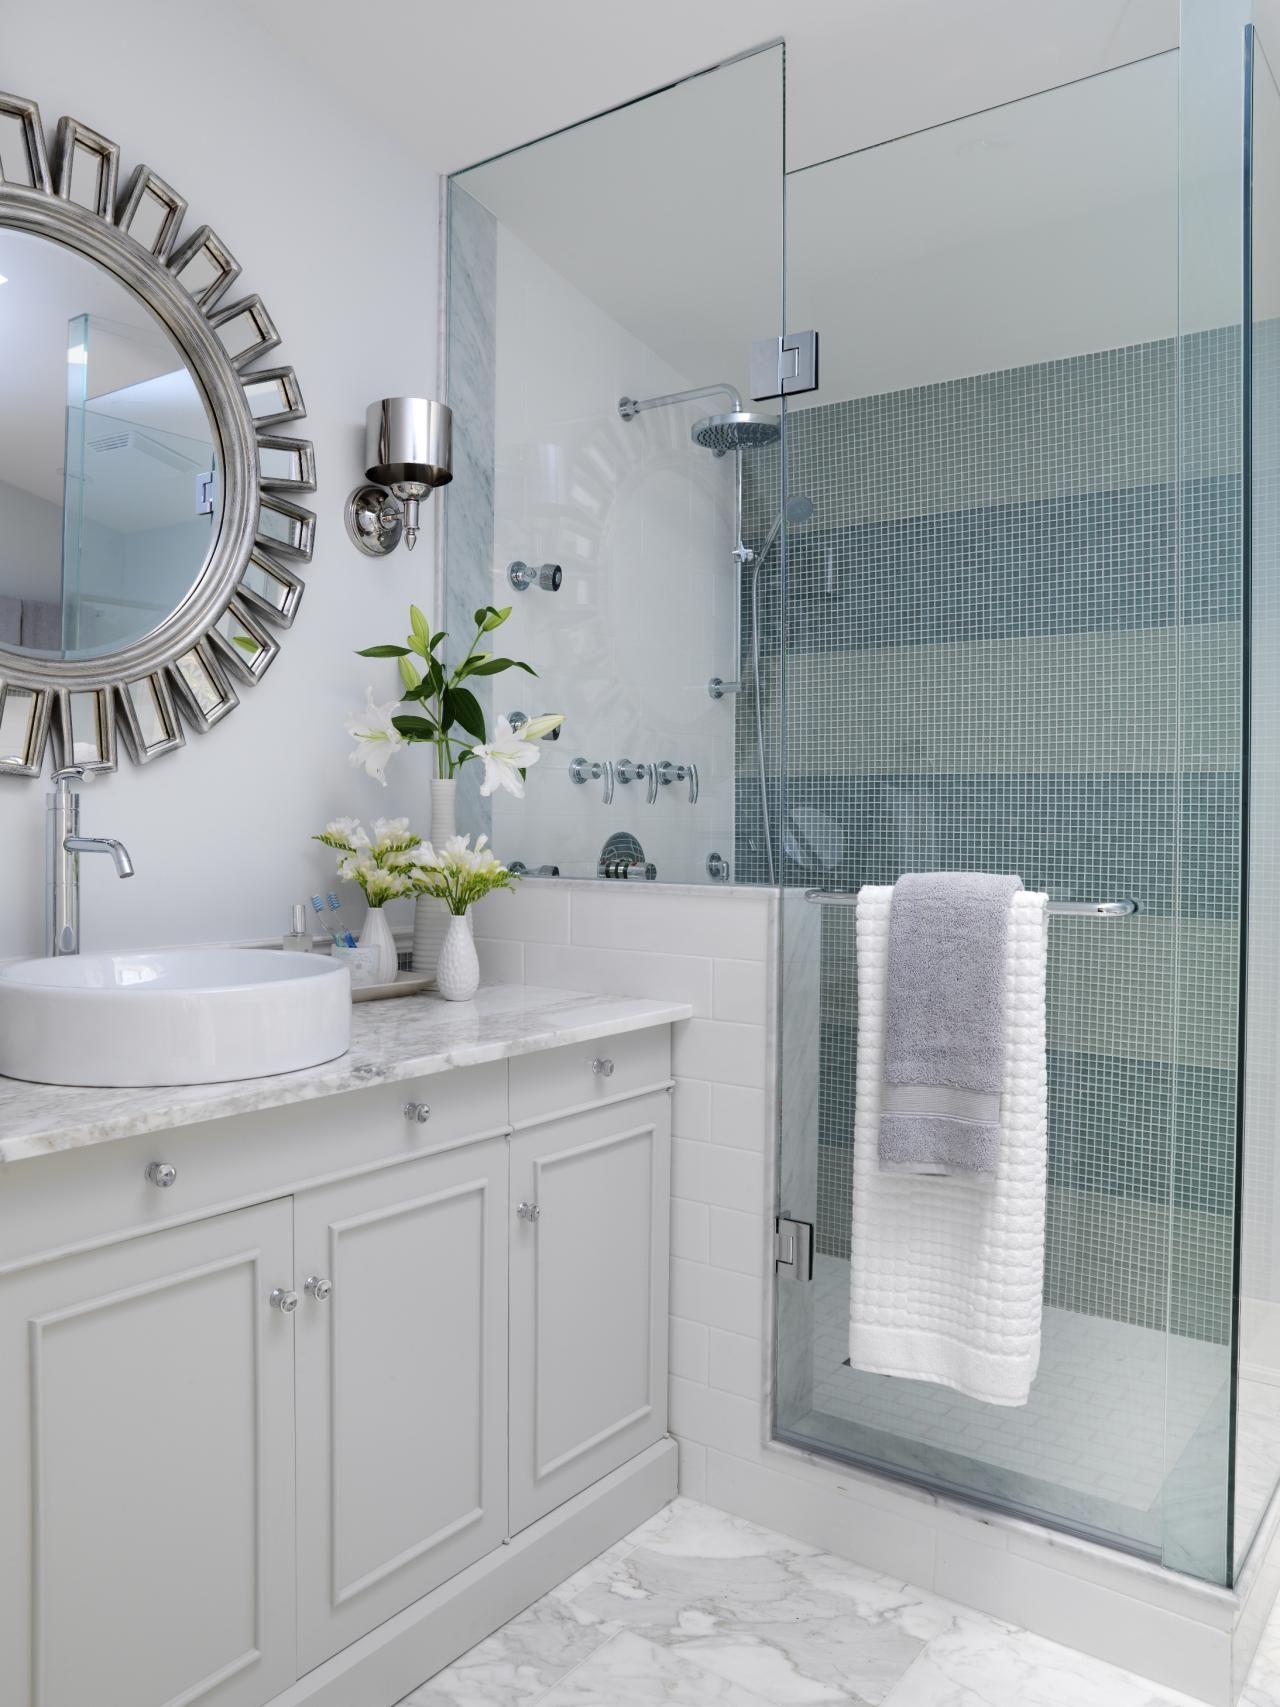 20 Small Bathroom Design Ideas Bathroom Tile Designs Bathroom Design Small Small Bathroom Tiles